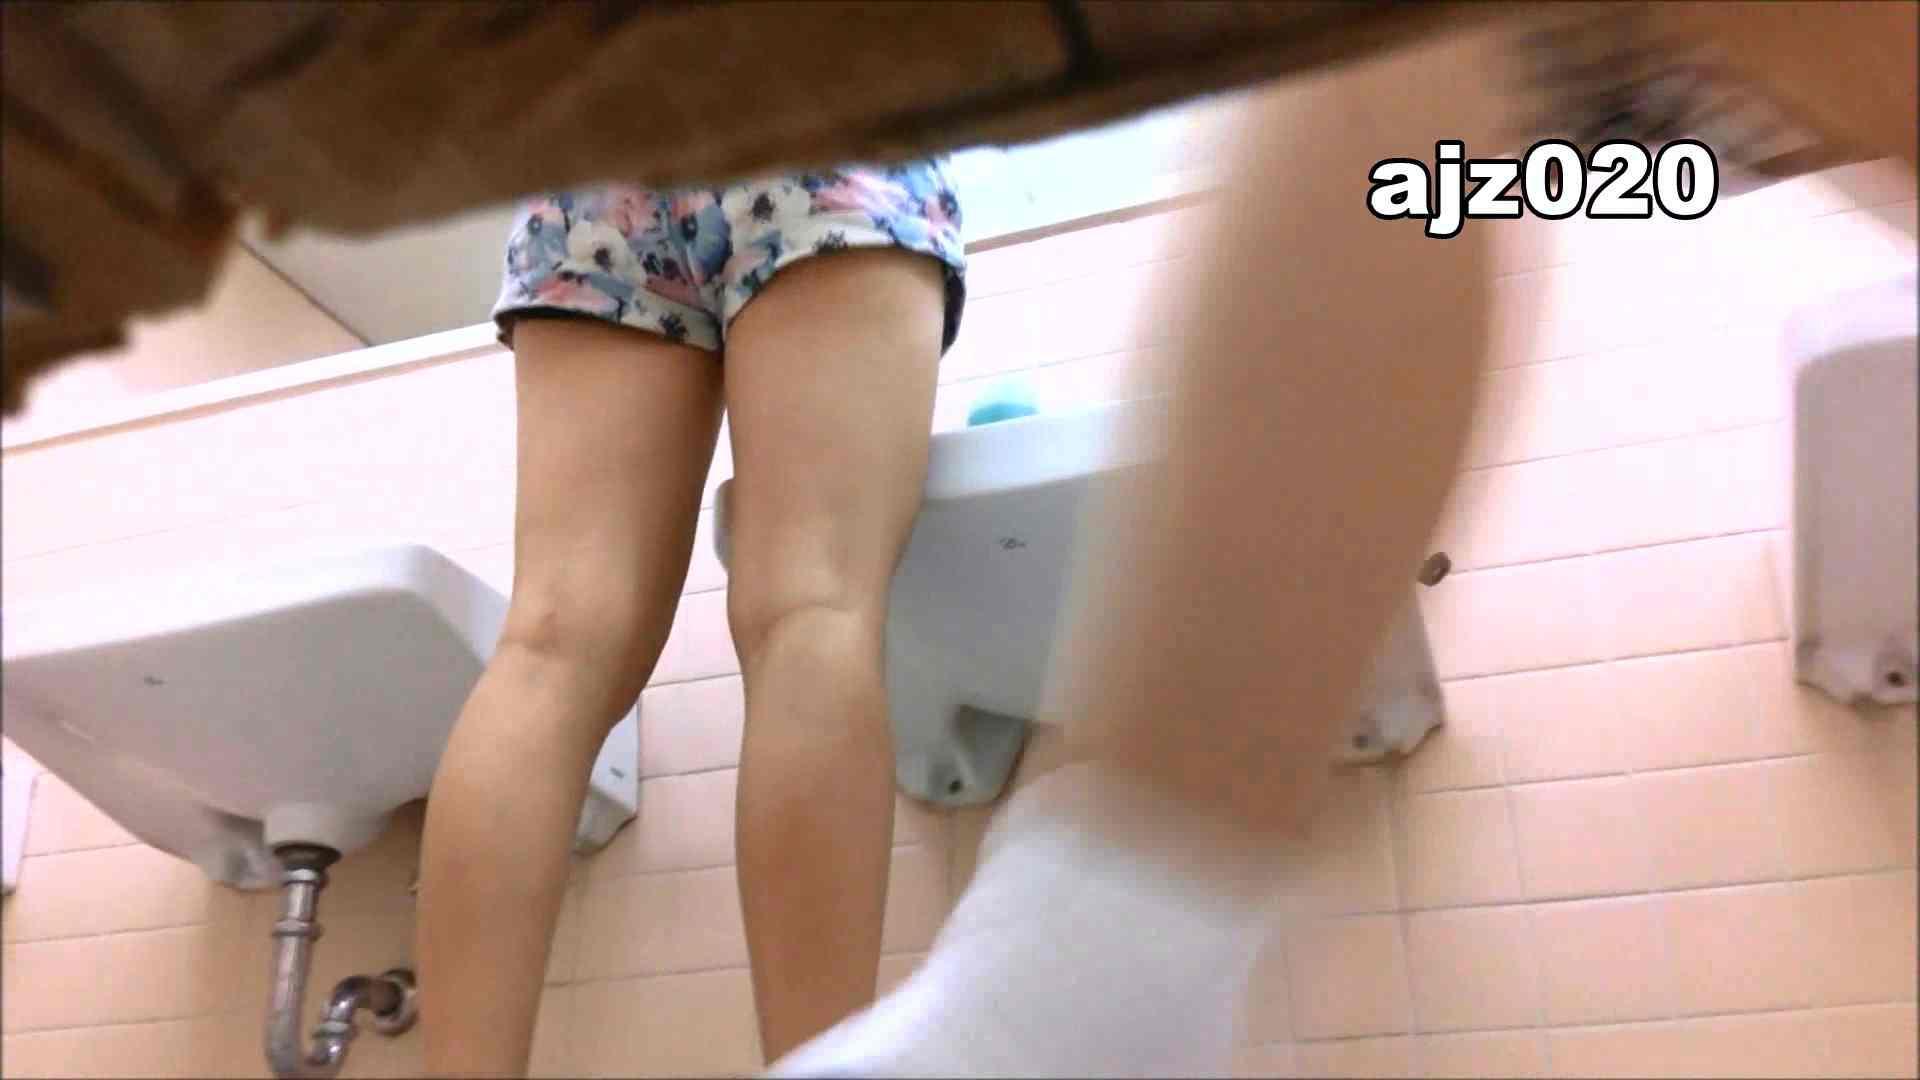 某有名大学女性洗面所 vol.20 洗面所突入 | 美しいOLの裸体  79pic 29